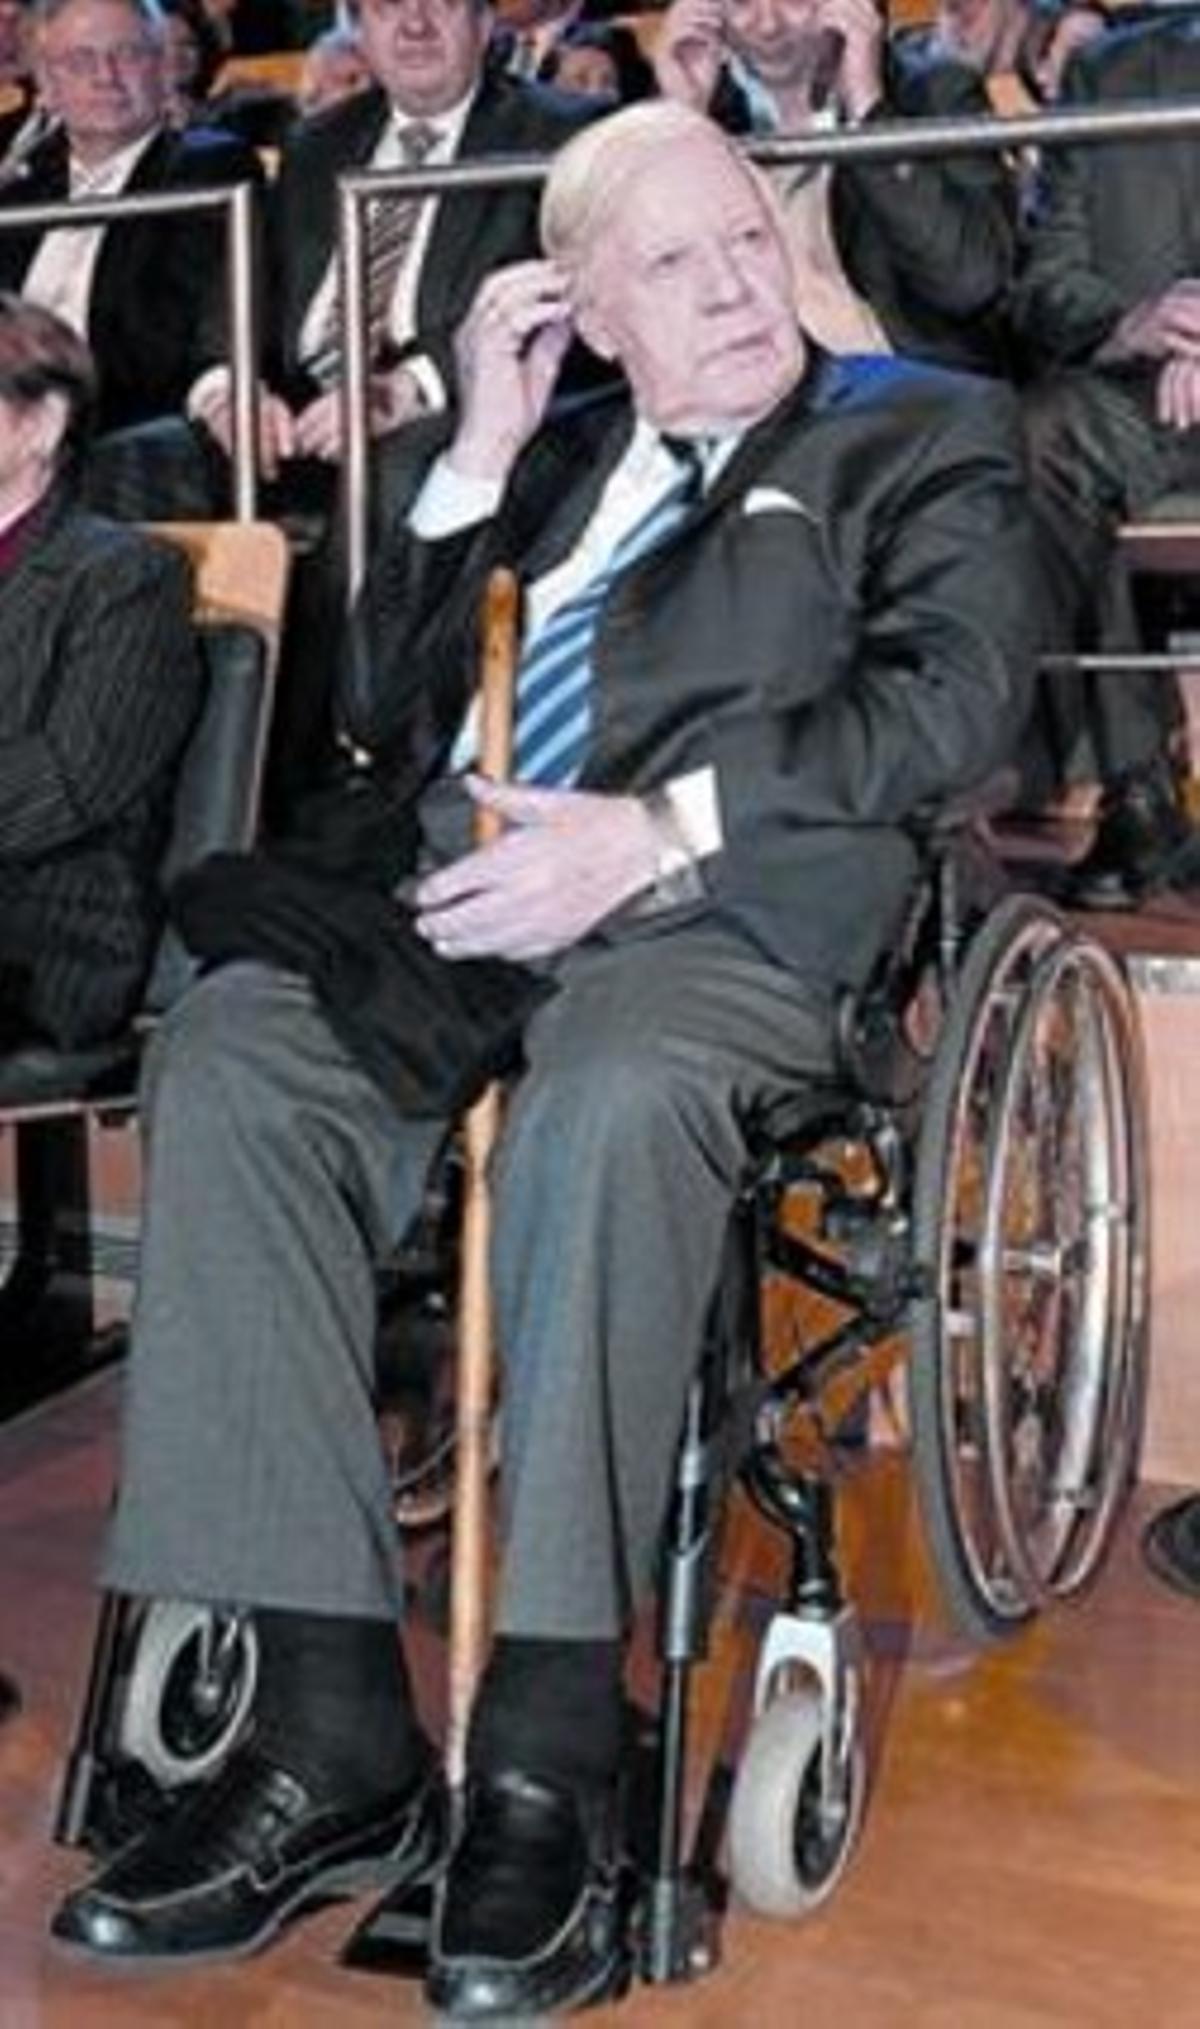 Salud frágil 8 Helmut Schmidt, en una televisión de Hamburgo.